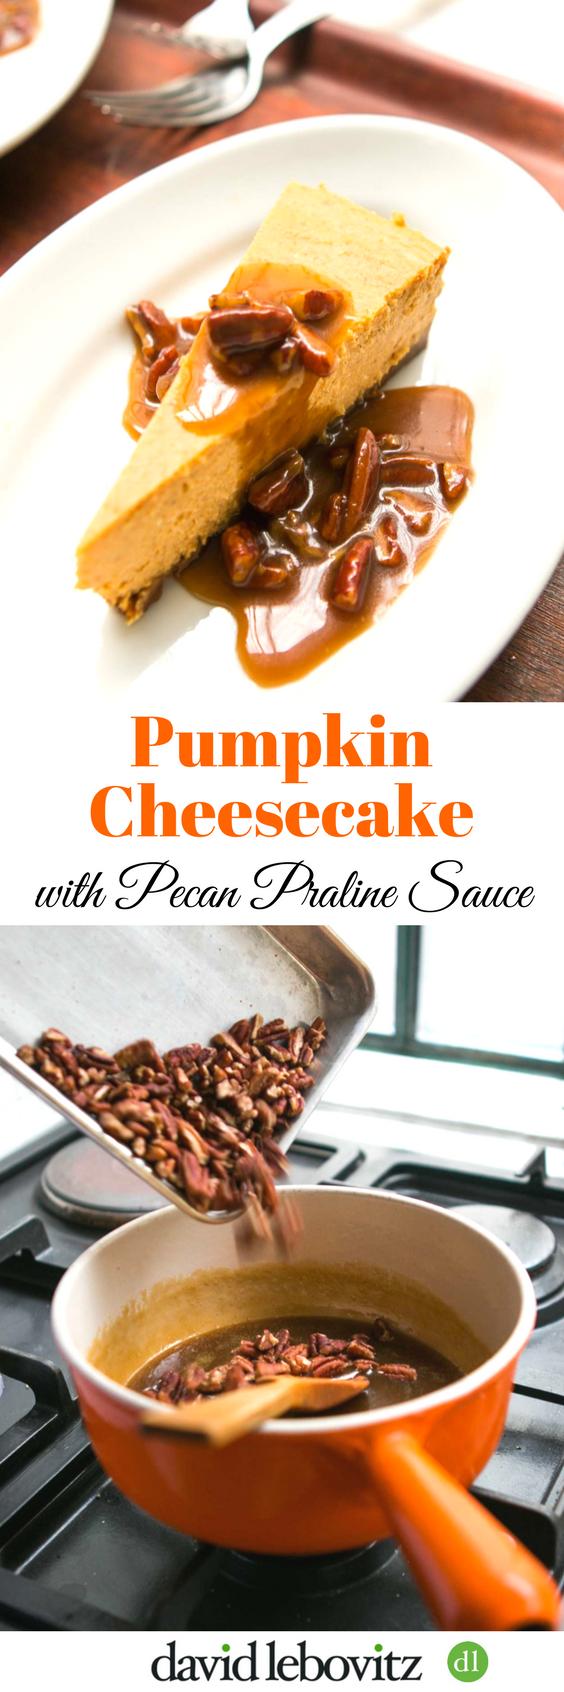 Pumpkin Cheesecake with Pecan Praline Sauce - a perfect holiday dessert!